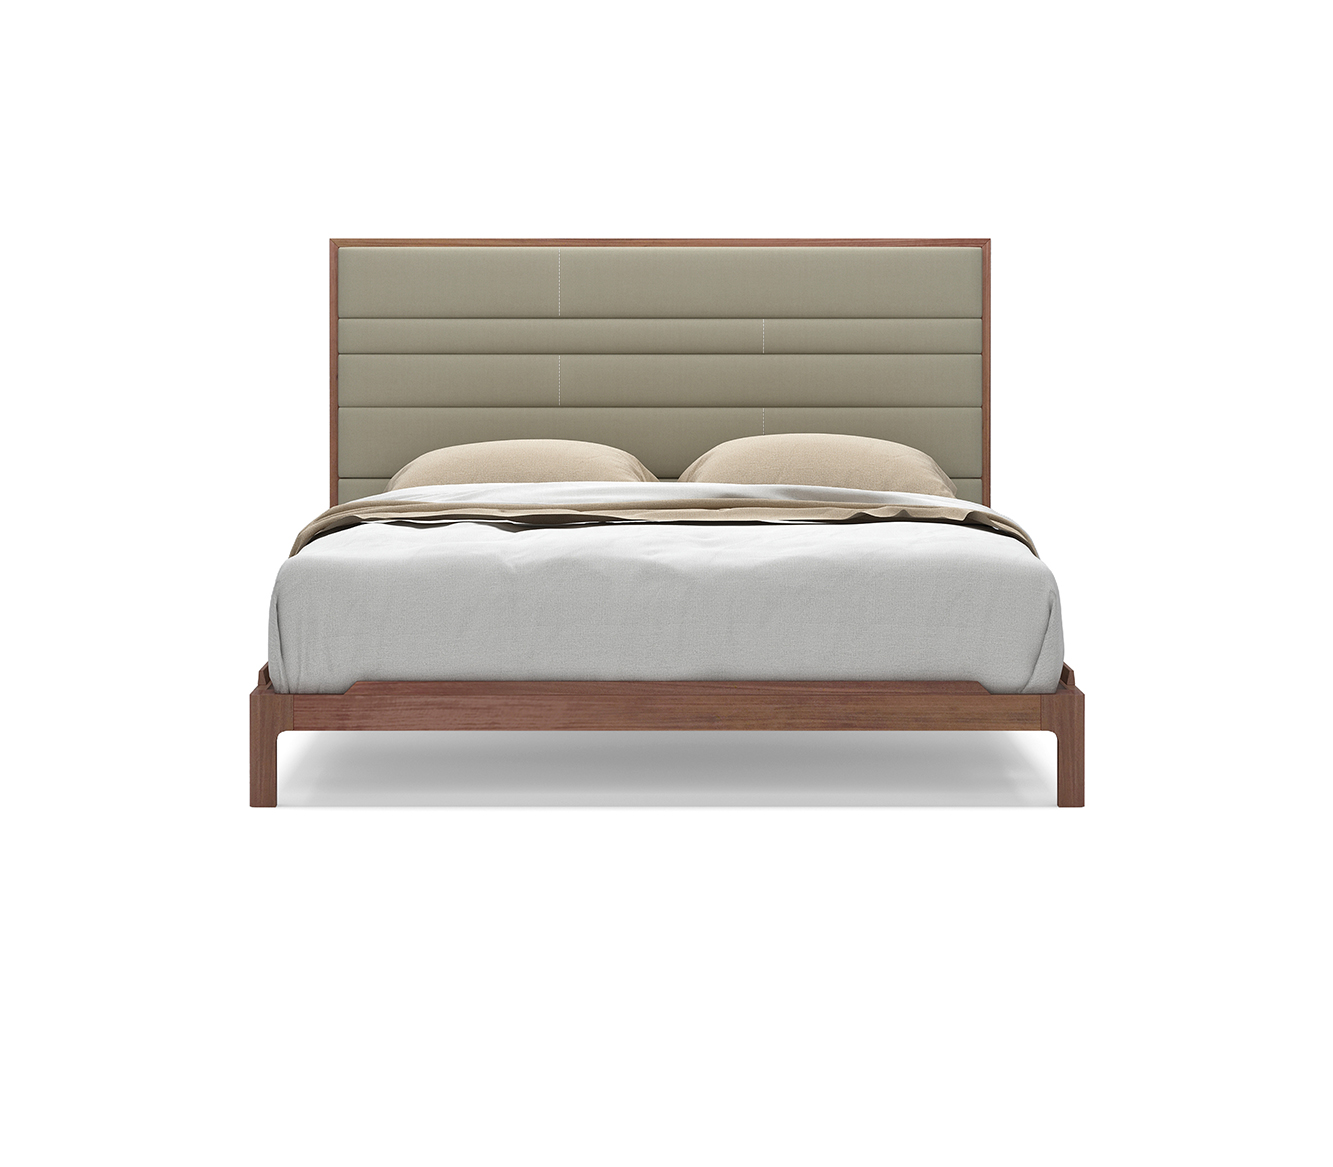 床 Bed  SC-07a / b / c